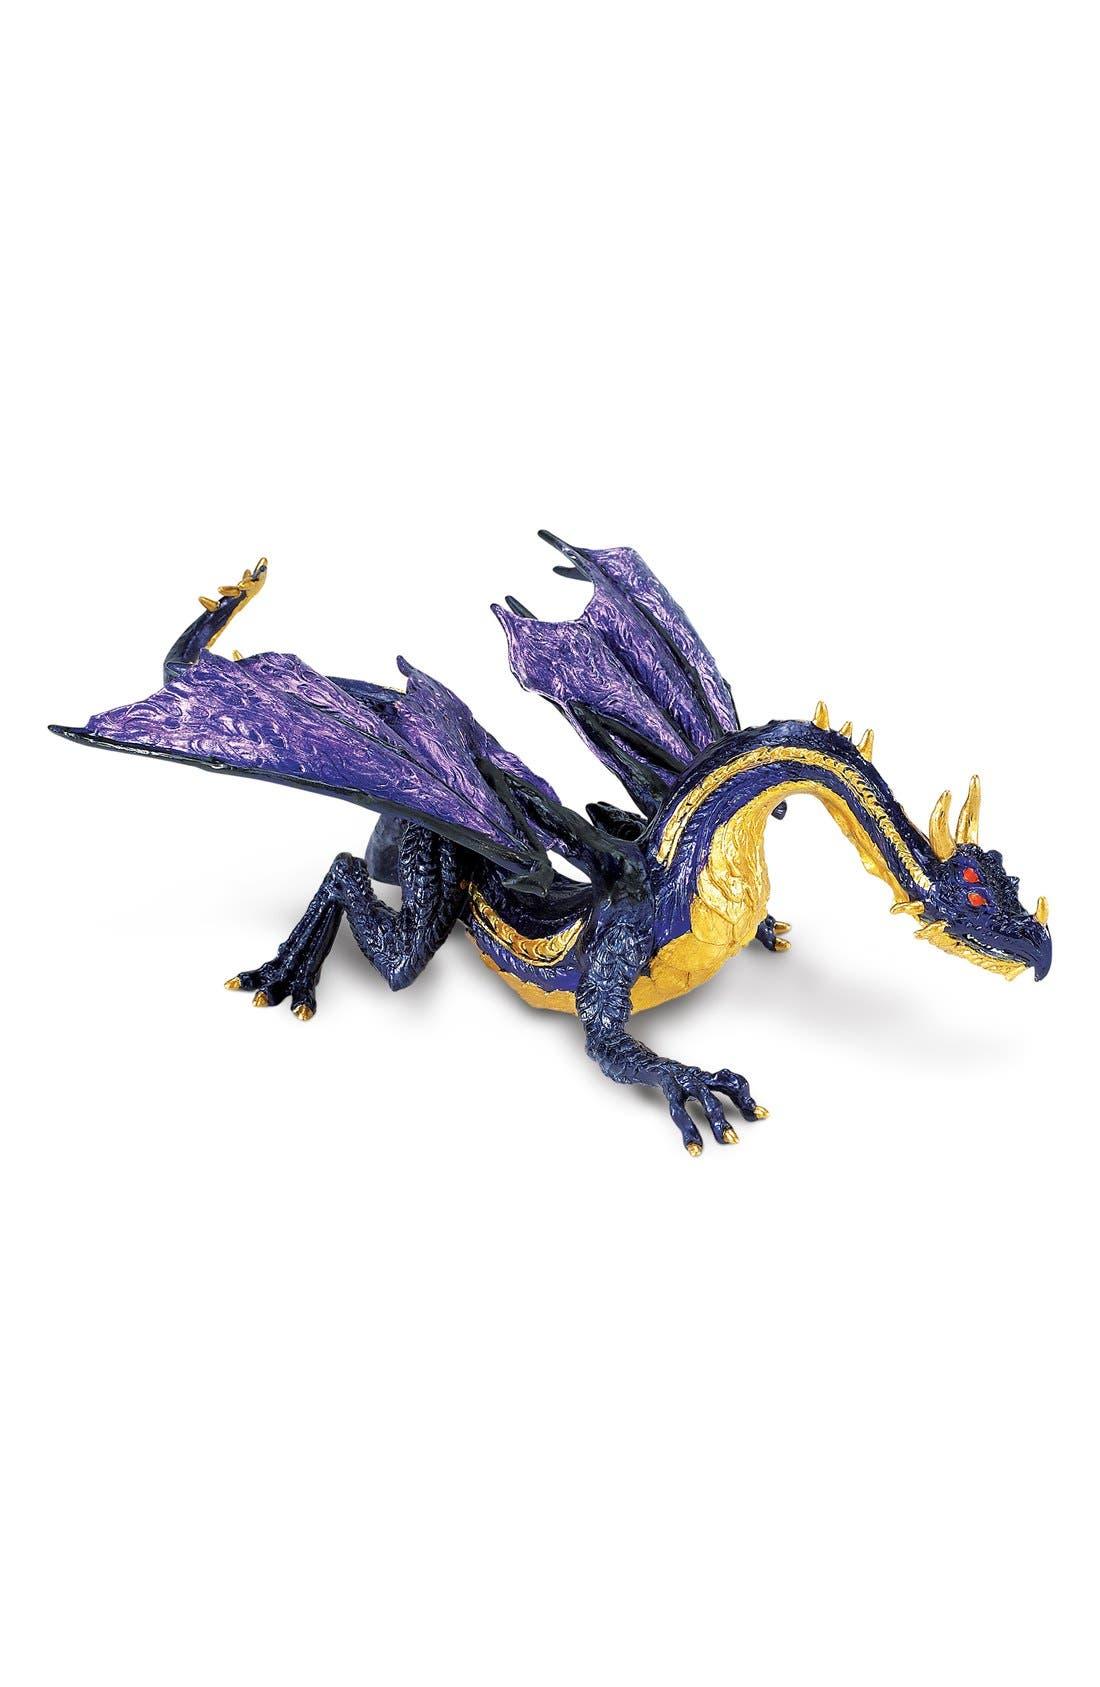 Midnight Moon Dragon Figurine,                         Main,                         color, Misc